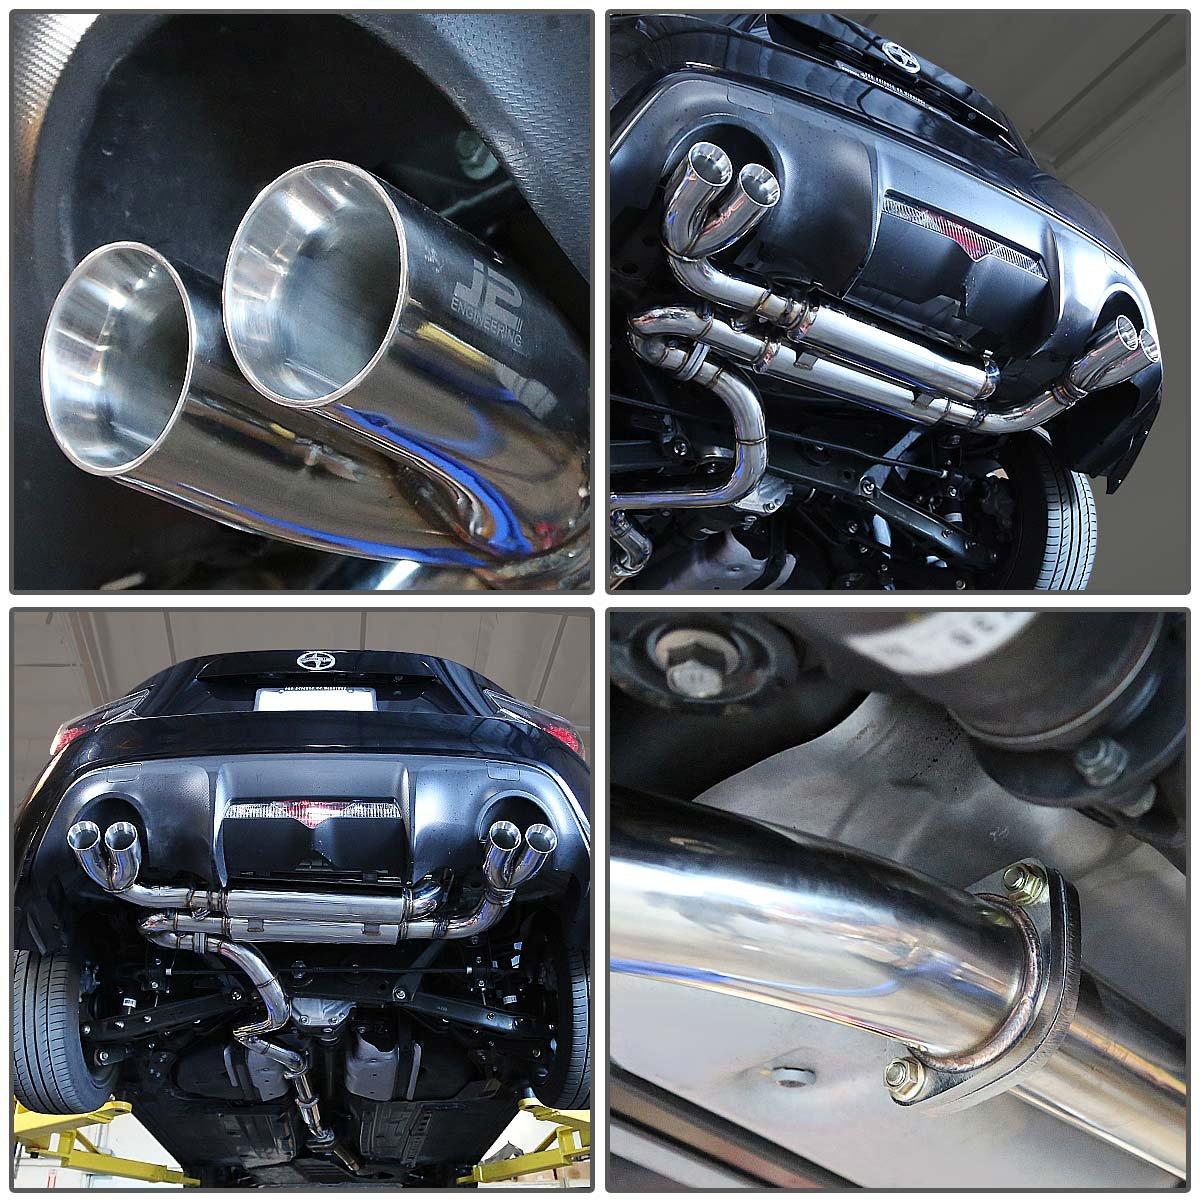 Amazon.com: DNA Motoring J2 Engineering J2-CBE-003 Catback Exhaust System: Automotive